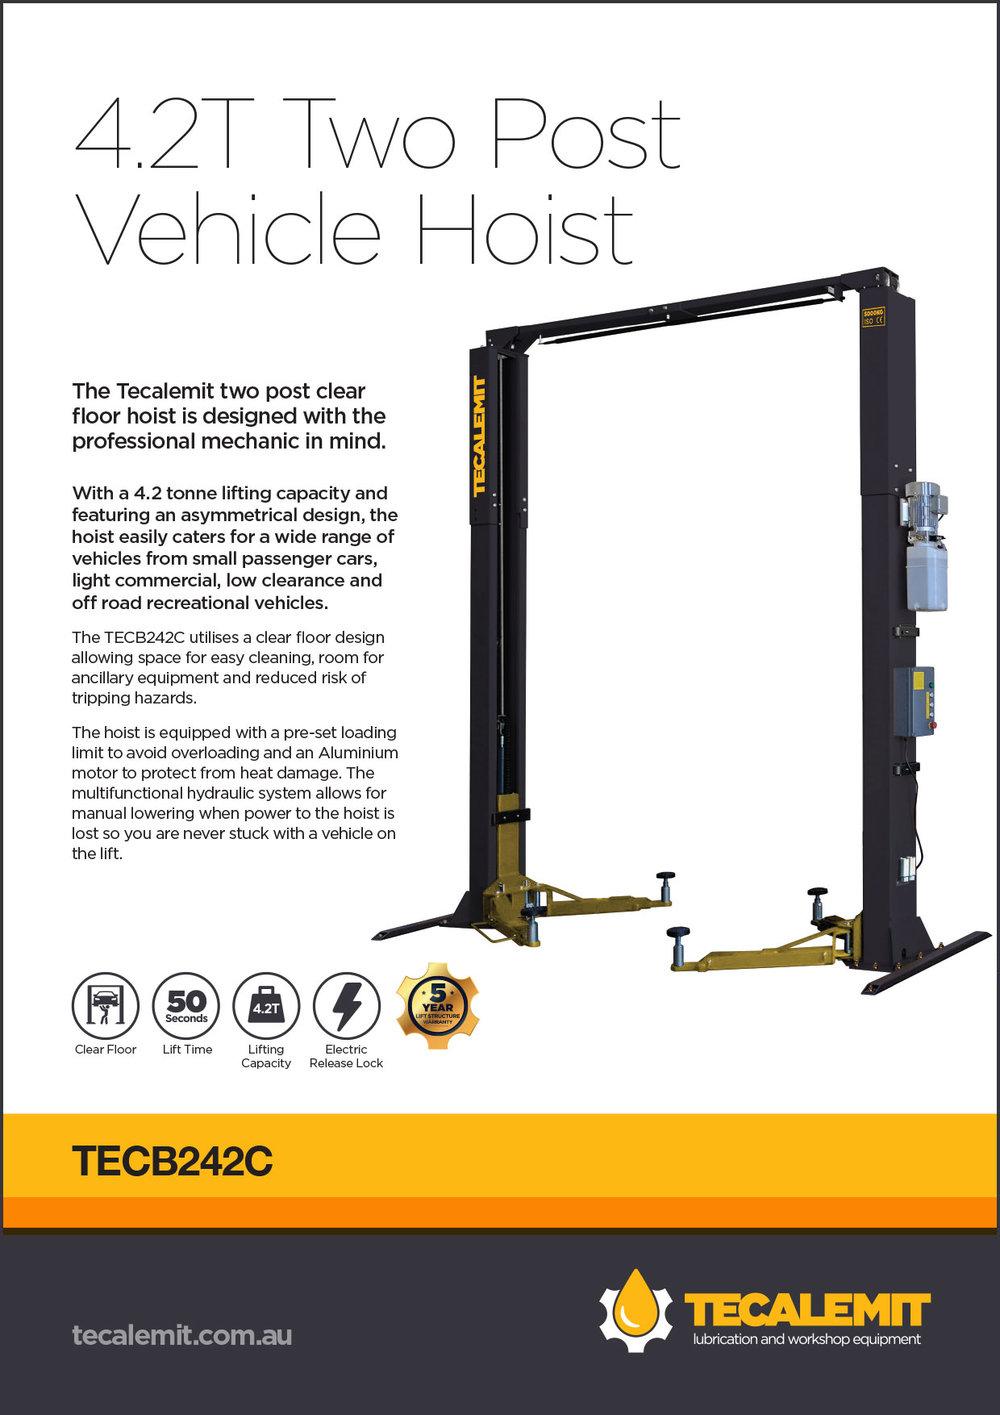 TECB242C Product Info